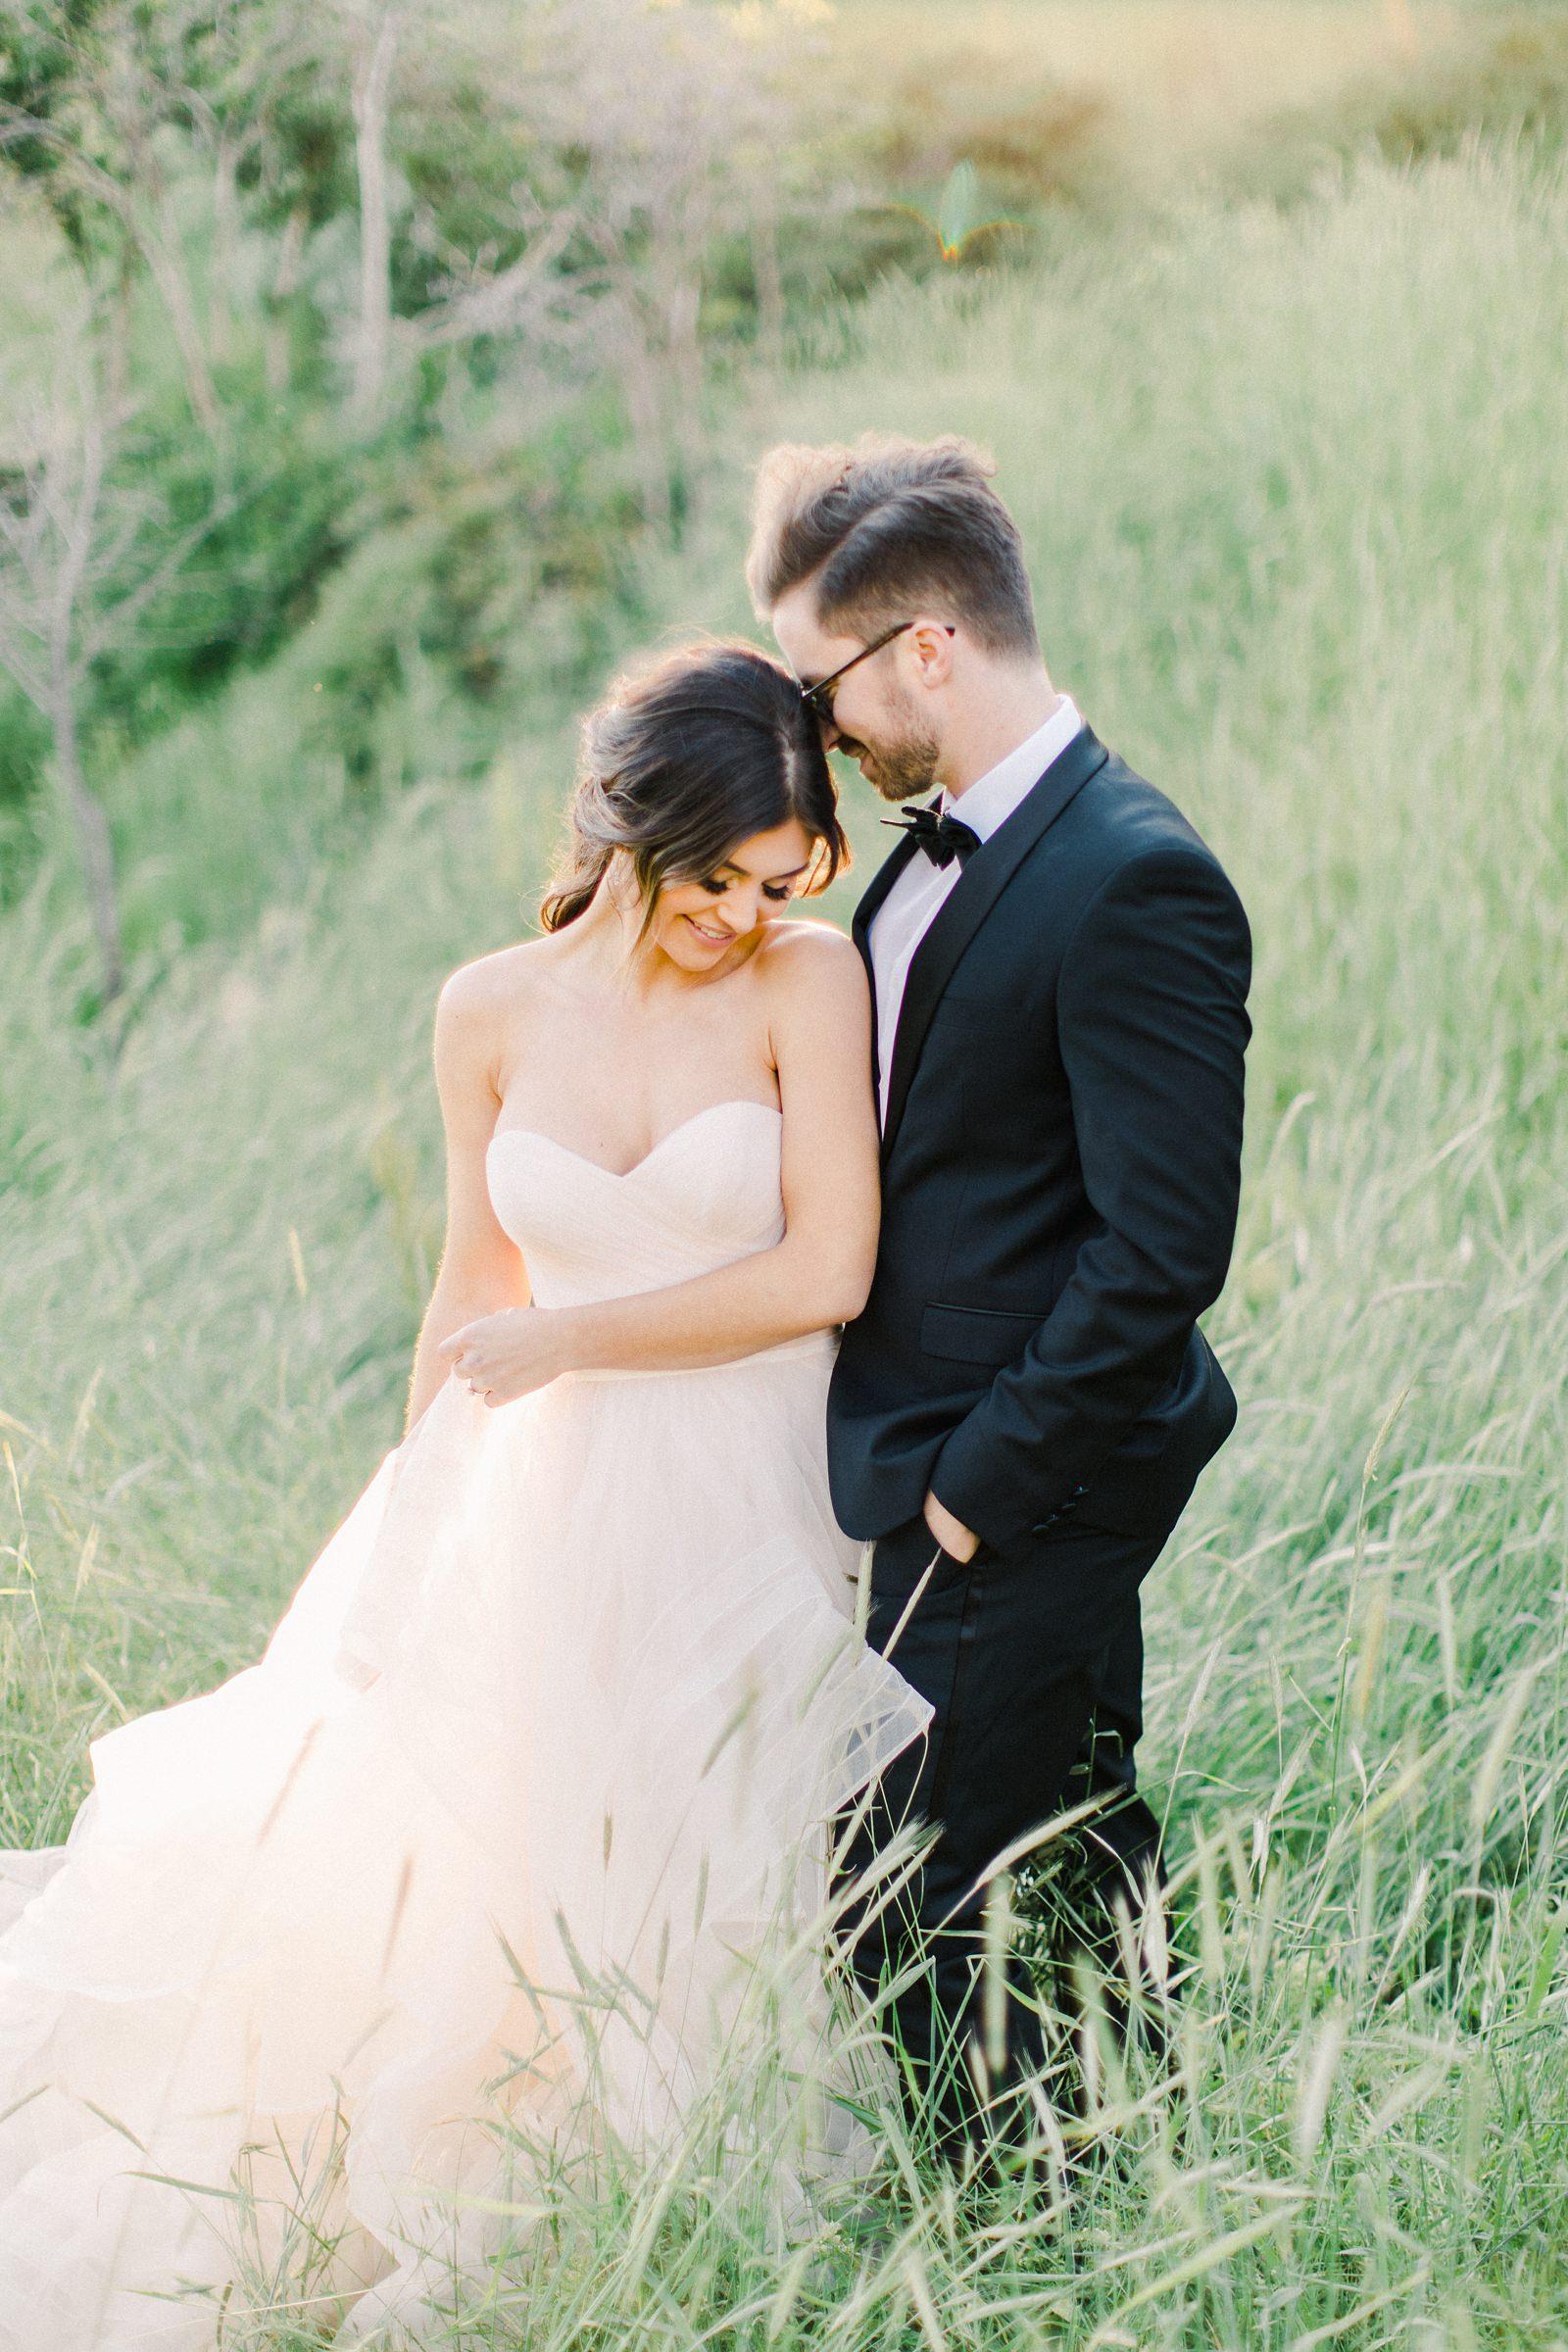 Outdoor Spring Secret Garden Wedding, Provo Utah Film Wedding Photography, bride and groom golden hour sunset light